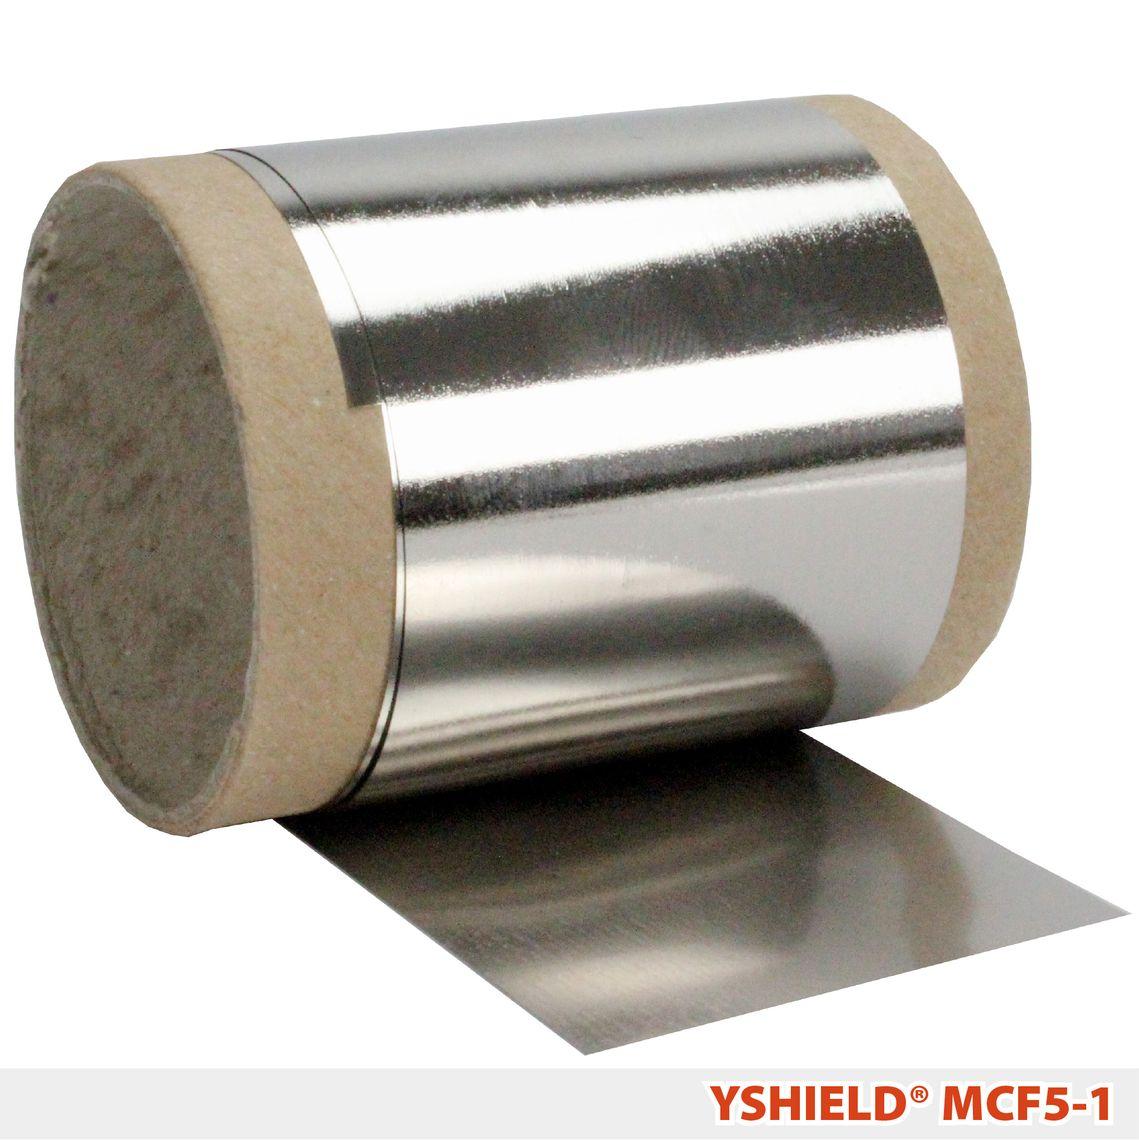 YSHIELD® MCF5 | Magnetic field shielding film | Width 5 cm | 1 meter